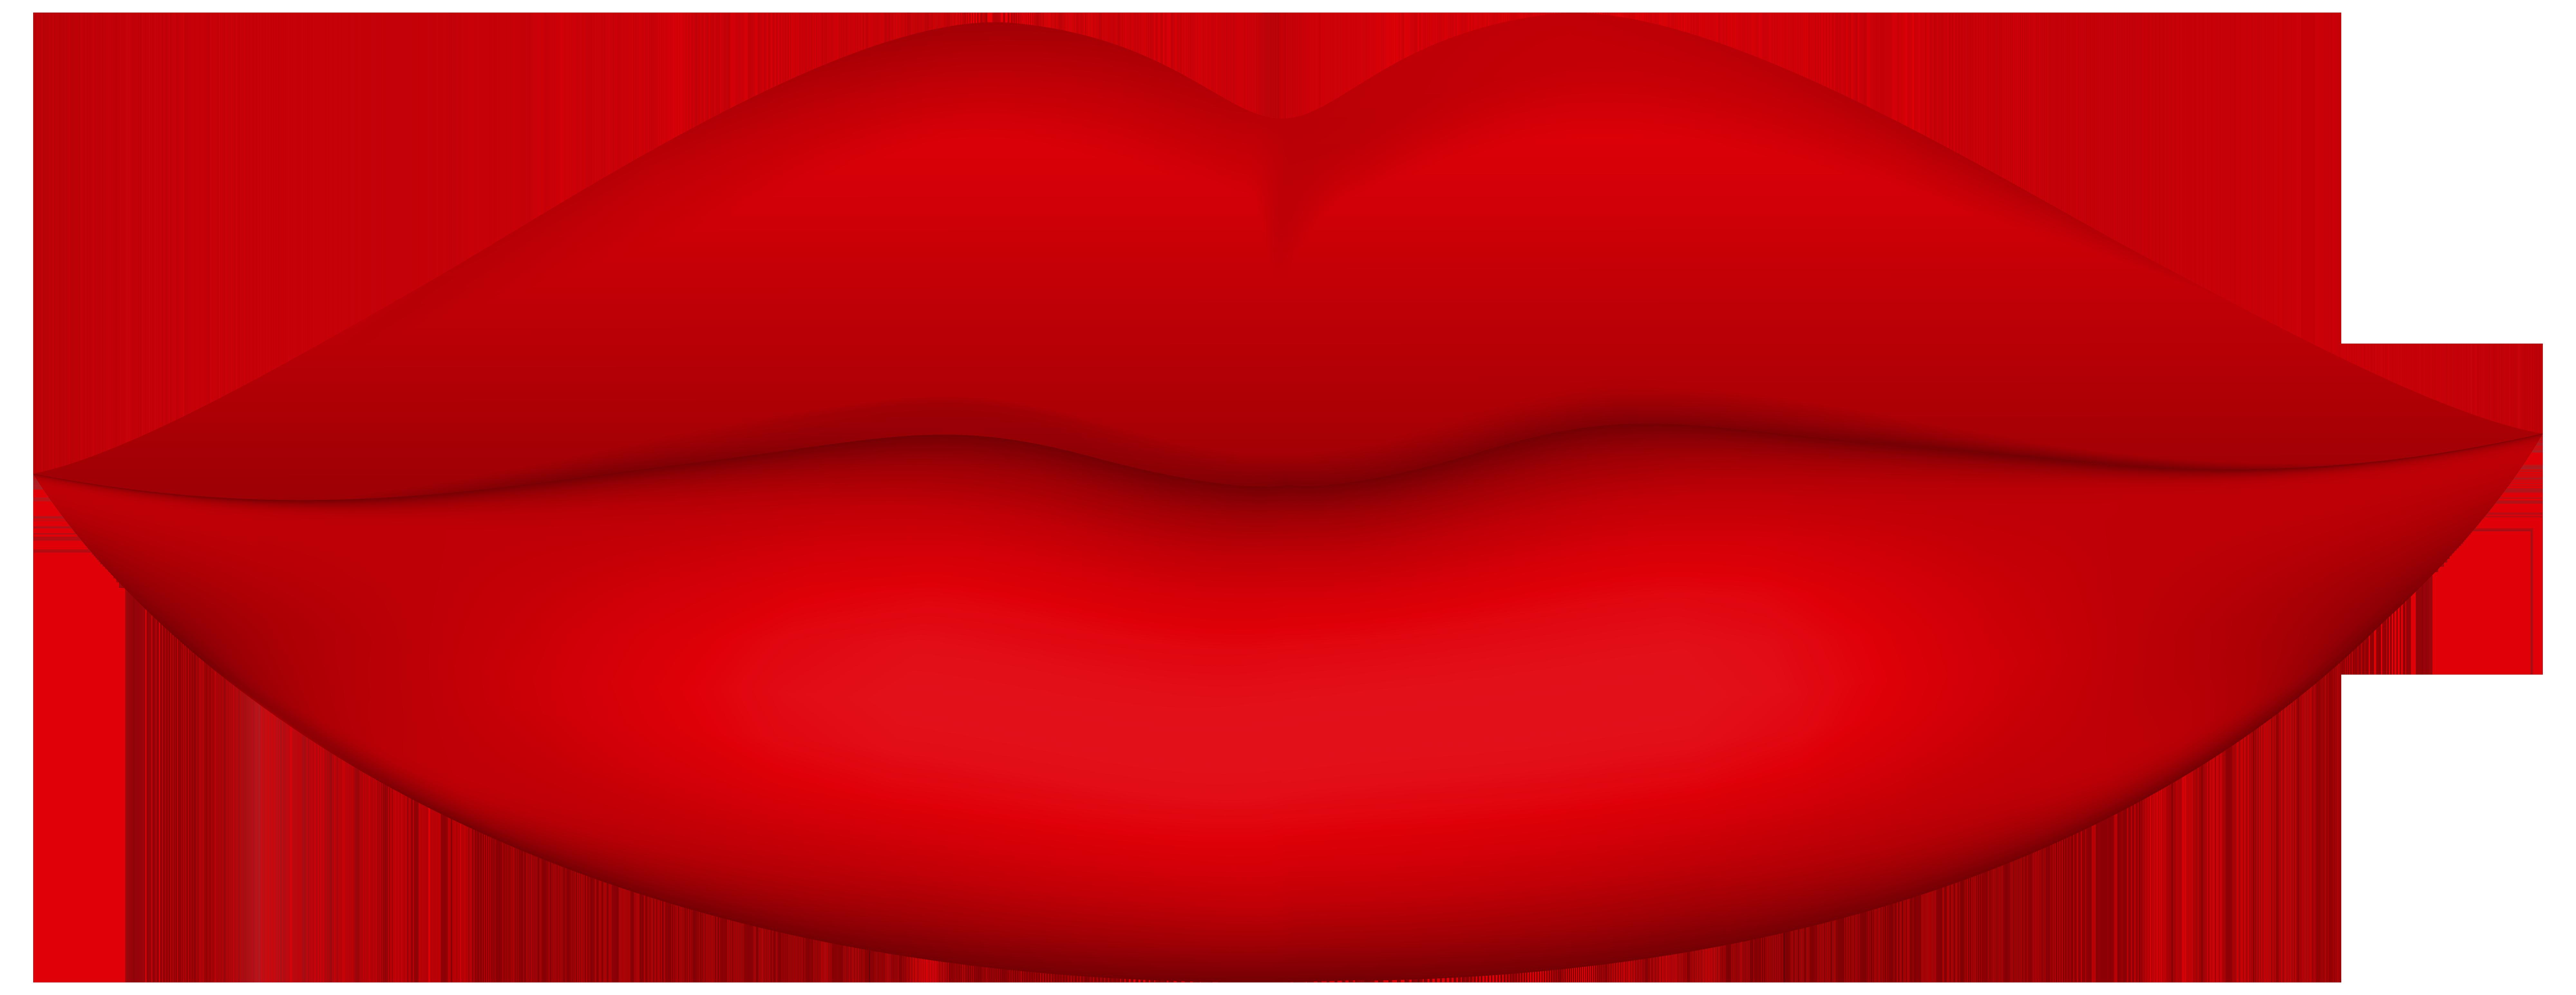 Lips clipart Clipartner Clipart Clip Images &